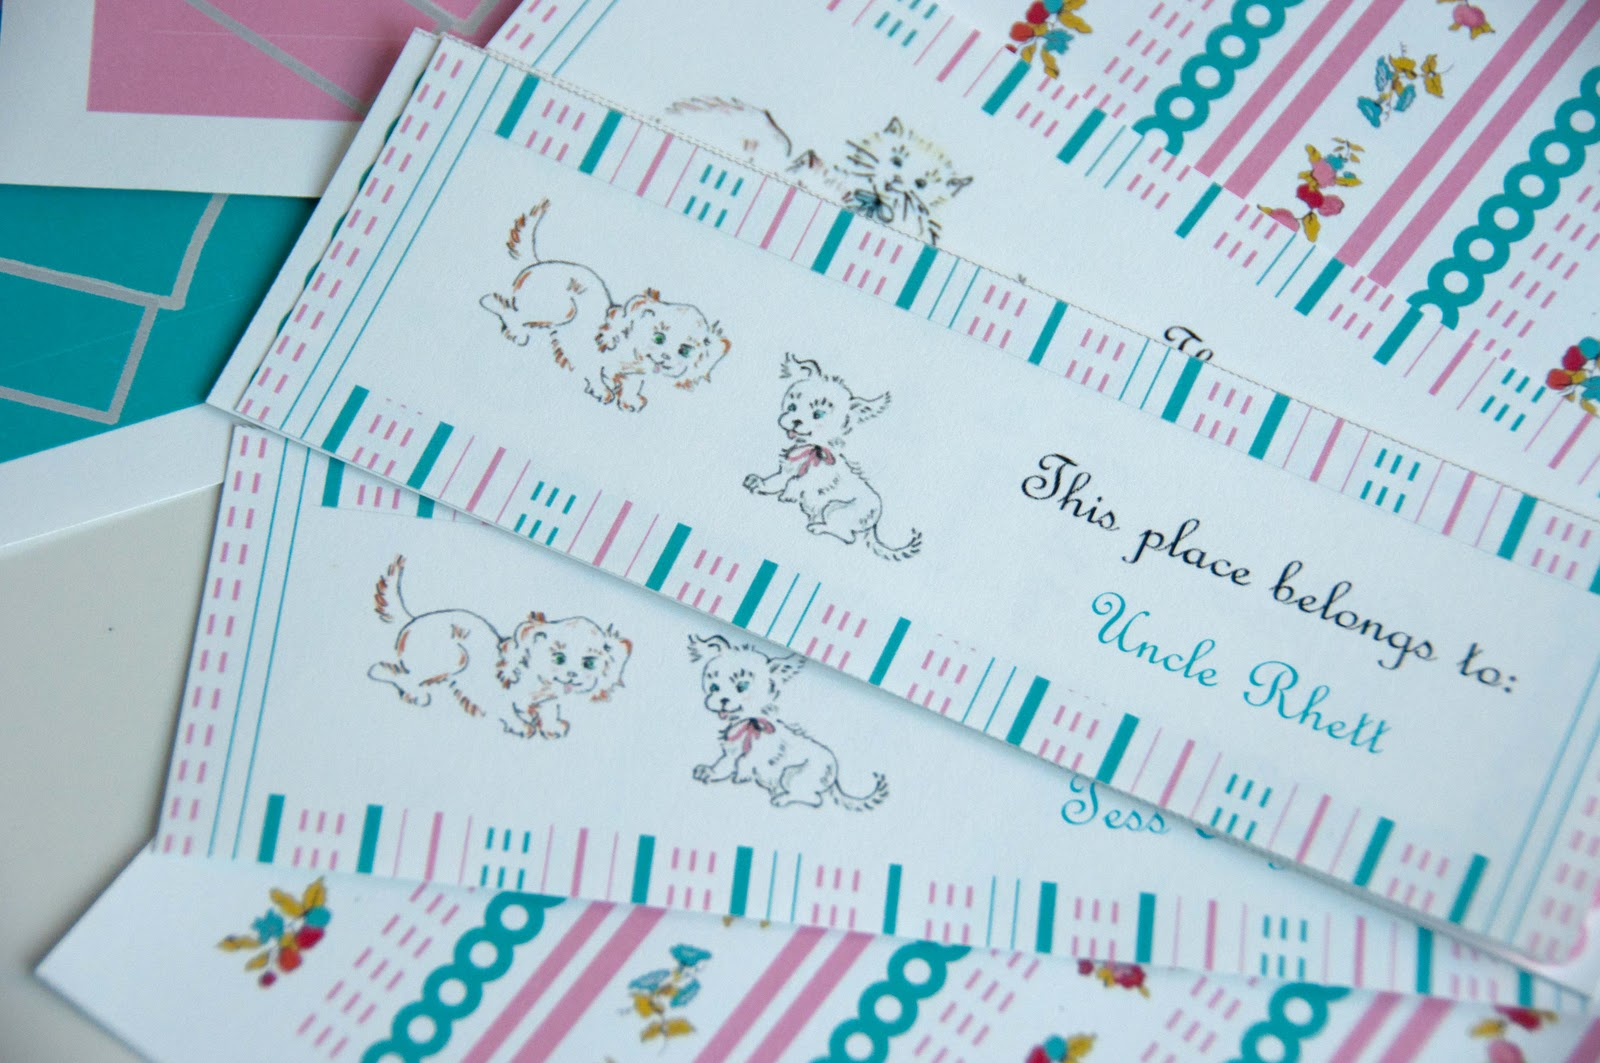 http://1.bp.blogspot.com/-fISIslBGq6Y/Tw-9tBBGkLI/AAAAAAAAJ4A/xArxVLewEOE/s1600/Vintage+Book+Birthday_scallop+wallpaper_Update+2012_DSC_0764.jpg